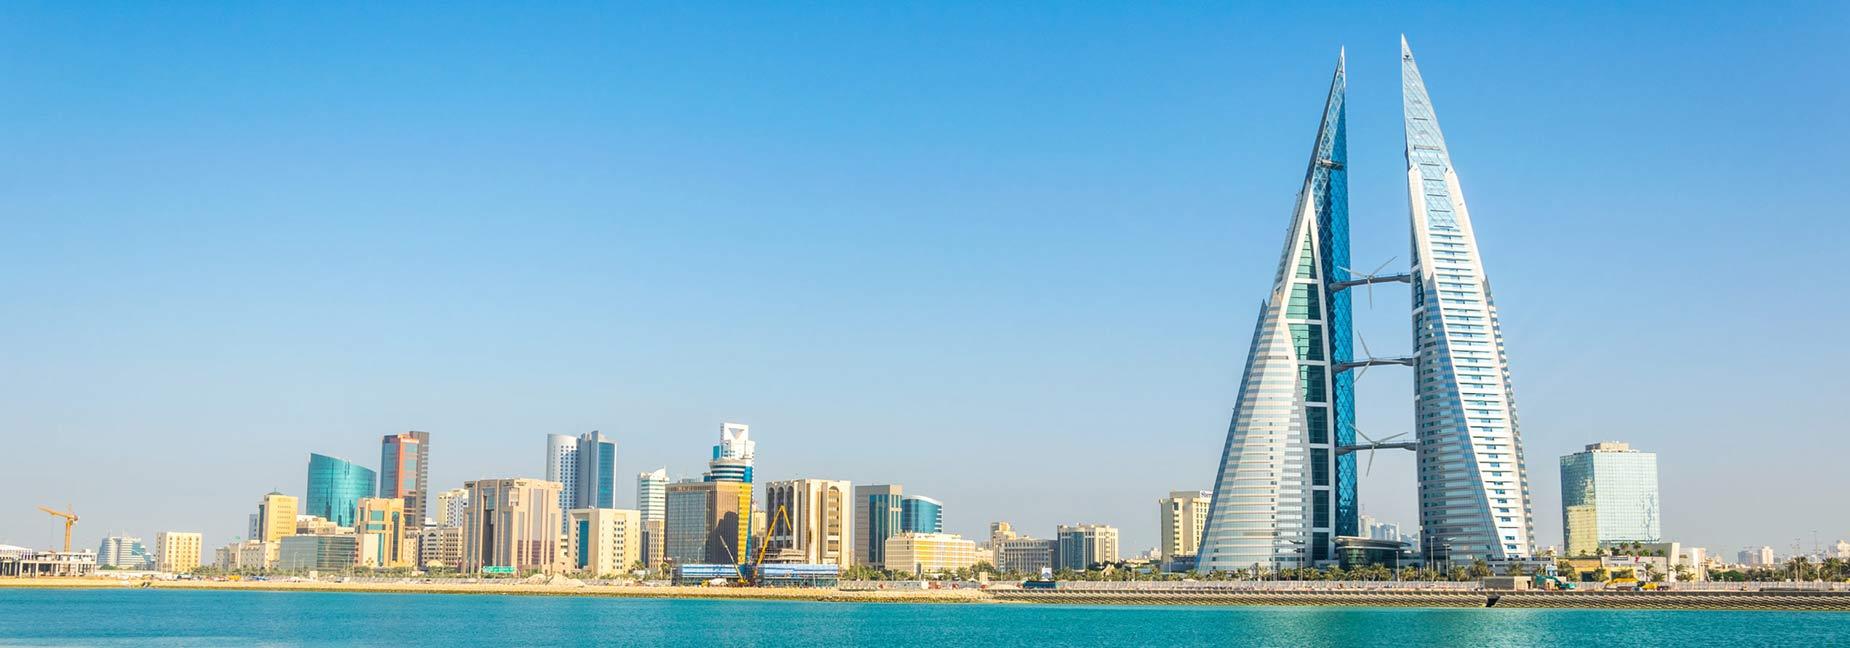 Spedizioni e trasporti in Bahrein